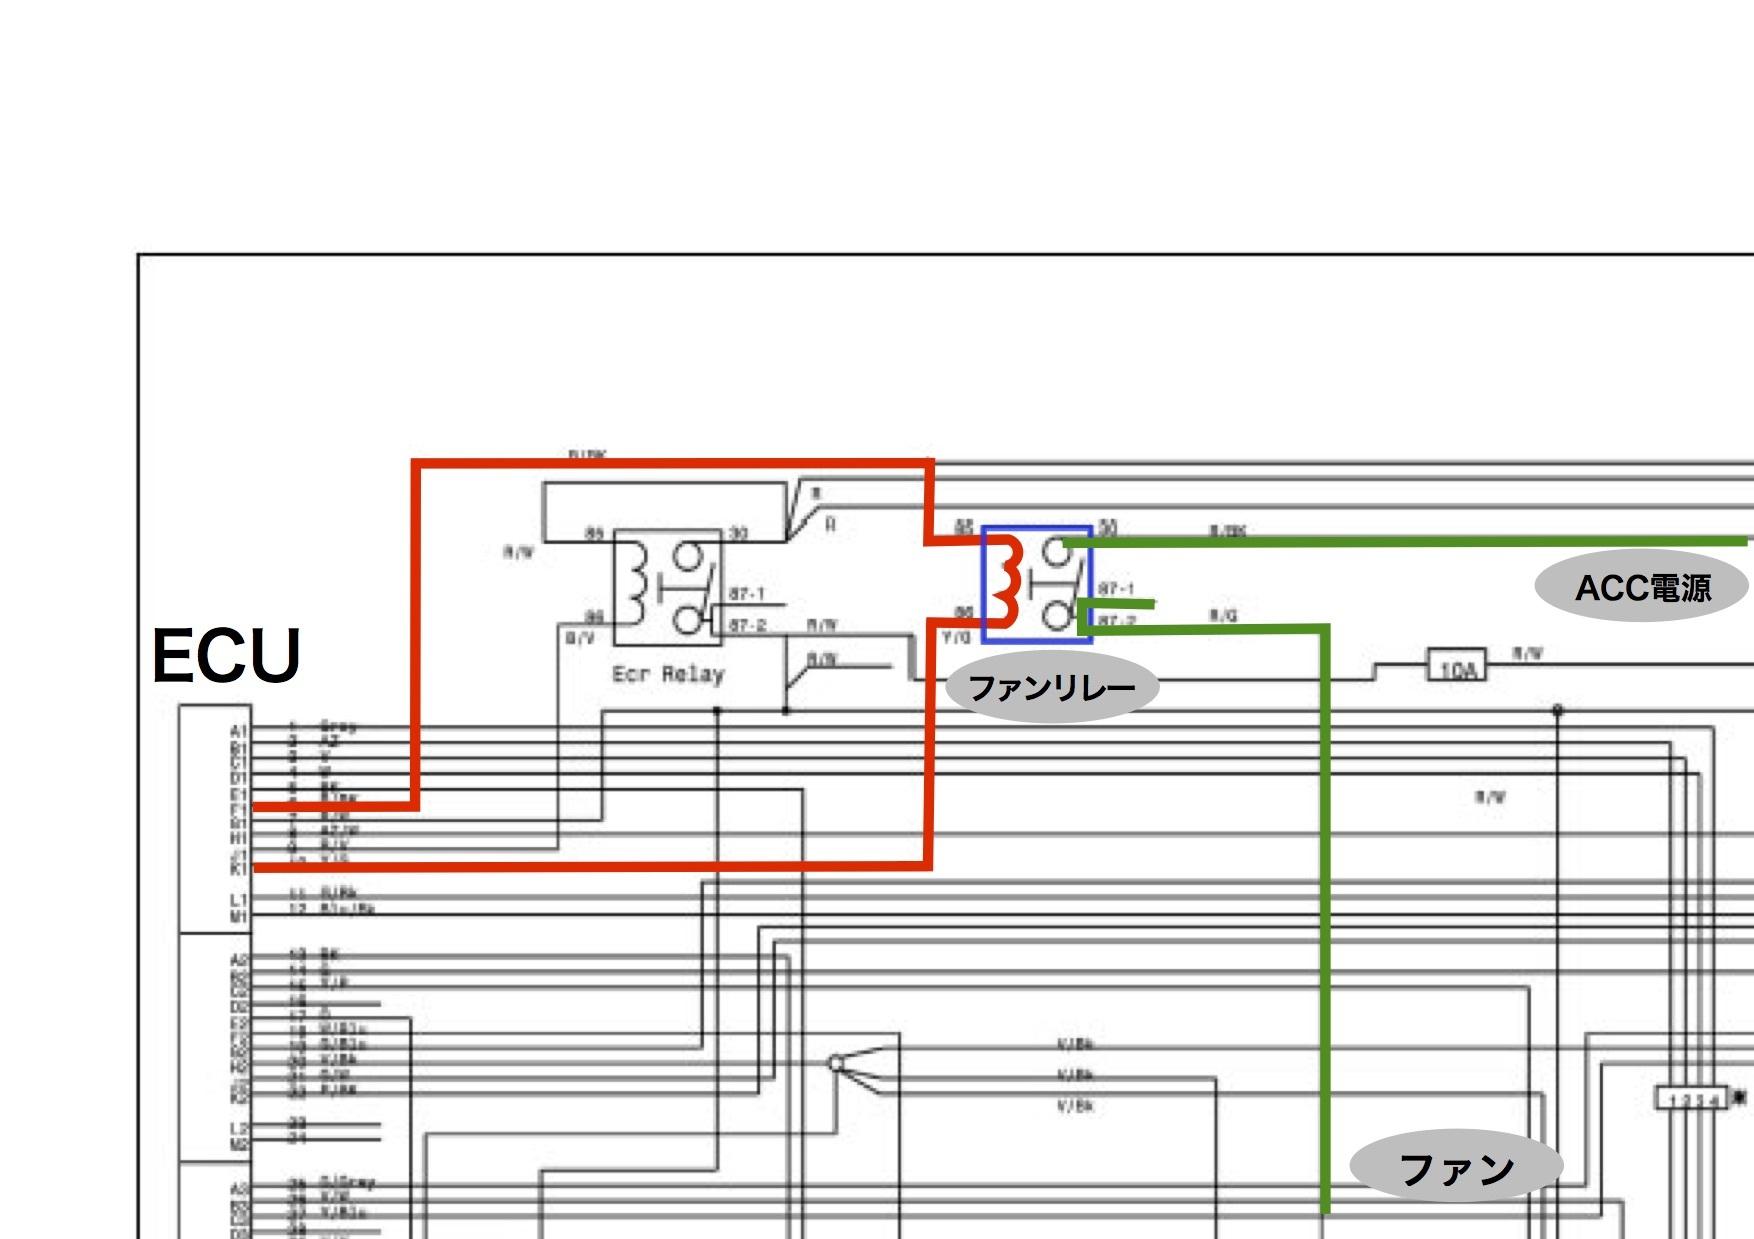 【DB7】サーミスタ回路 ACC電源がアレの件。原因はリレーか!?_e0159646_04275418.jpg